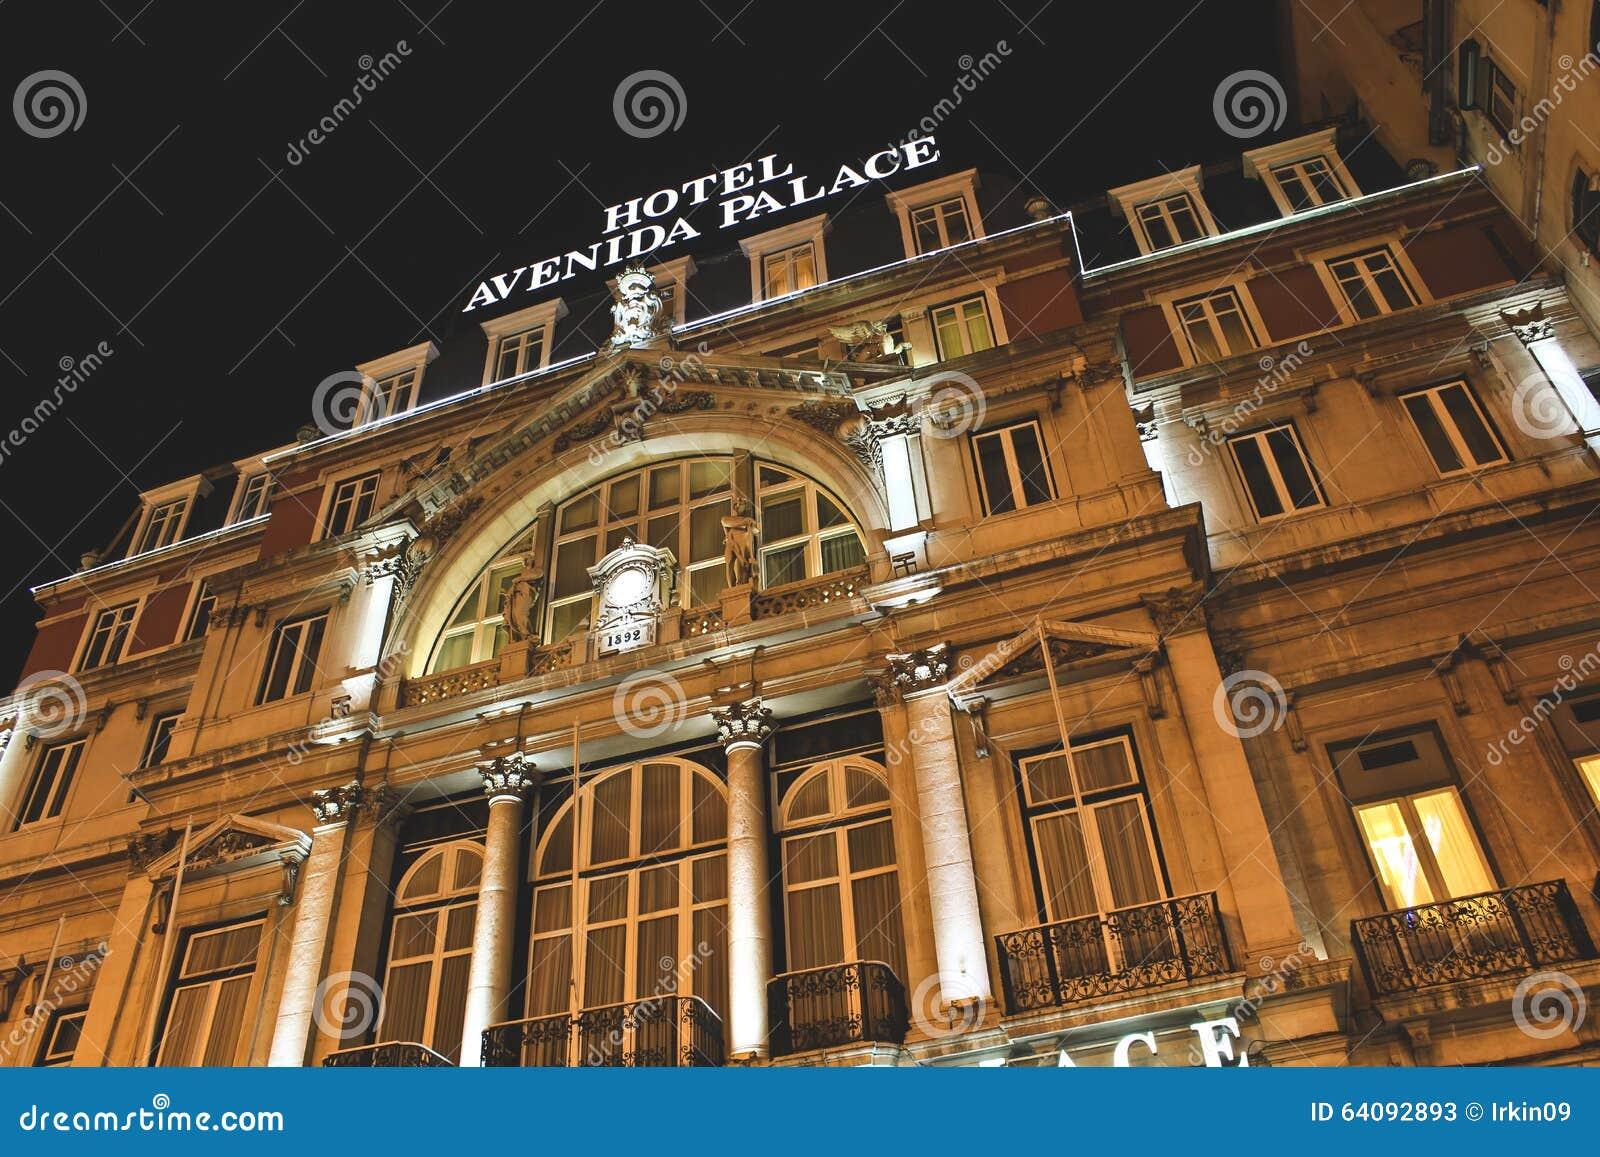 avenida palace hotel lisbon editorial stock photo image. Black Bedroom Furniture Sets. Home Design Ideas